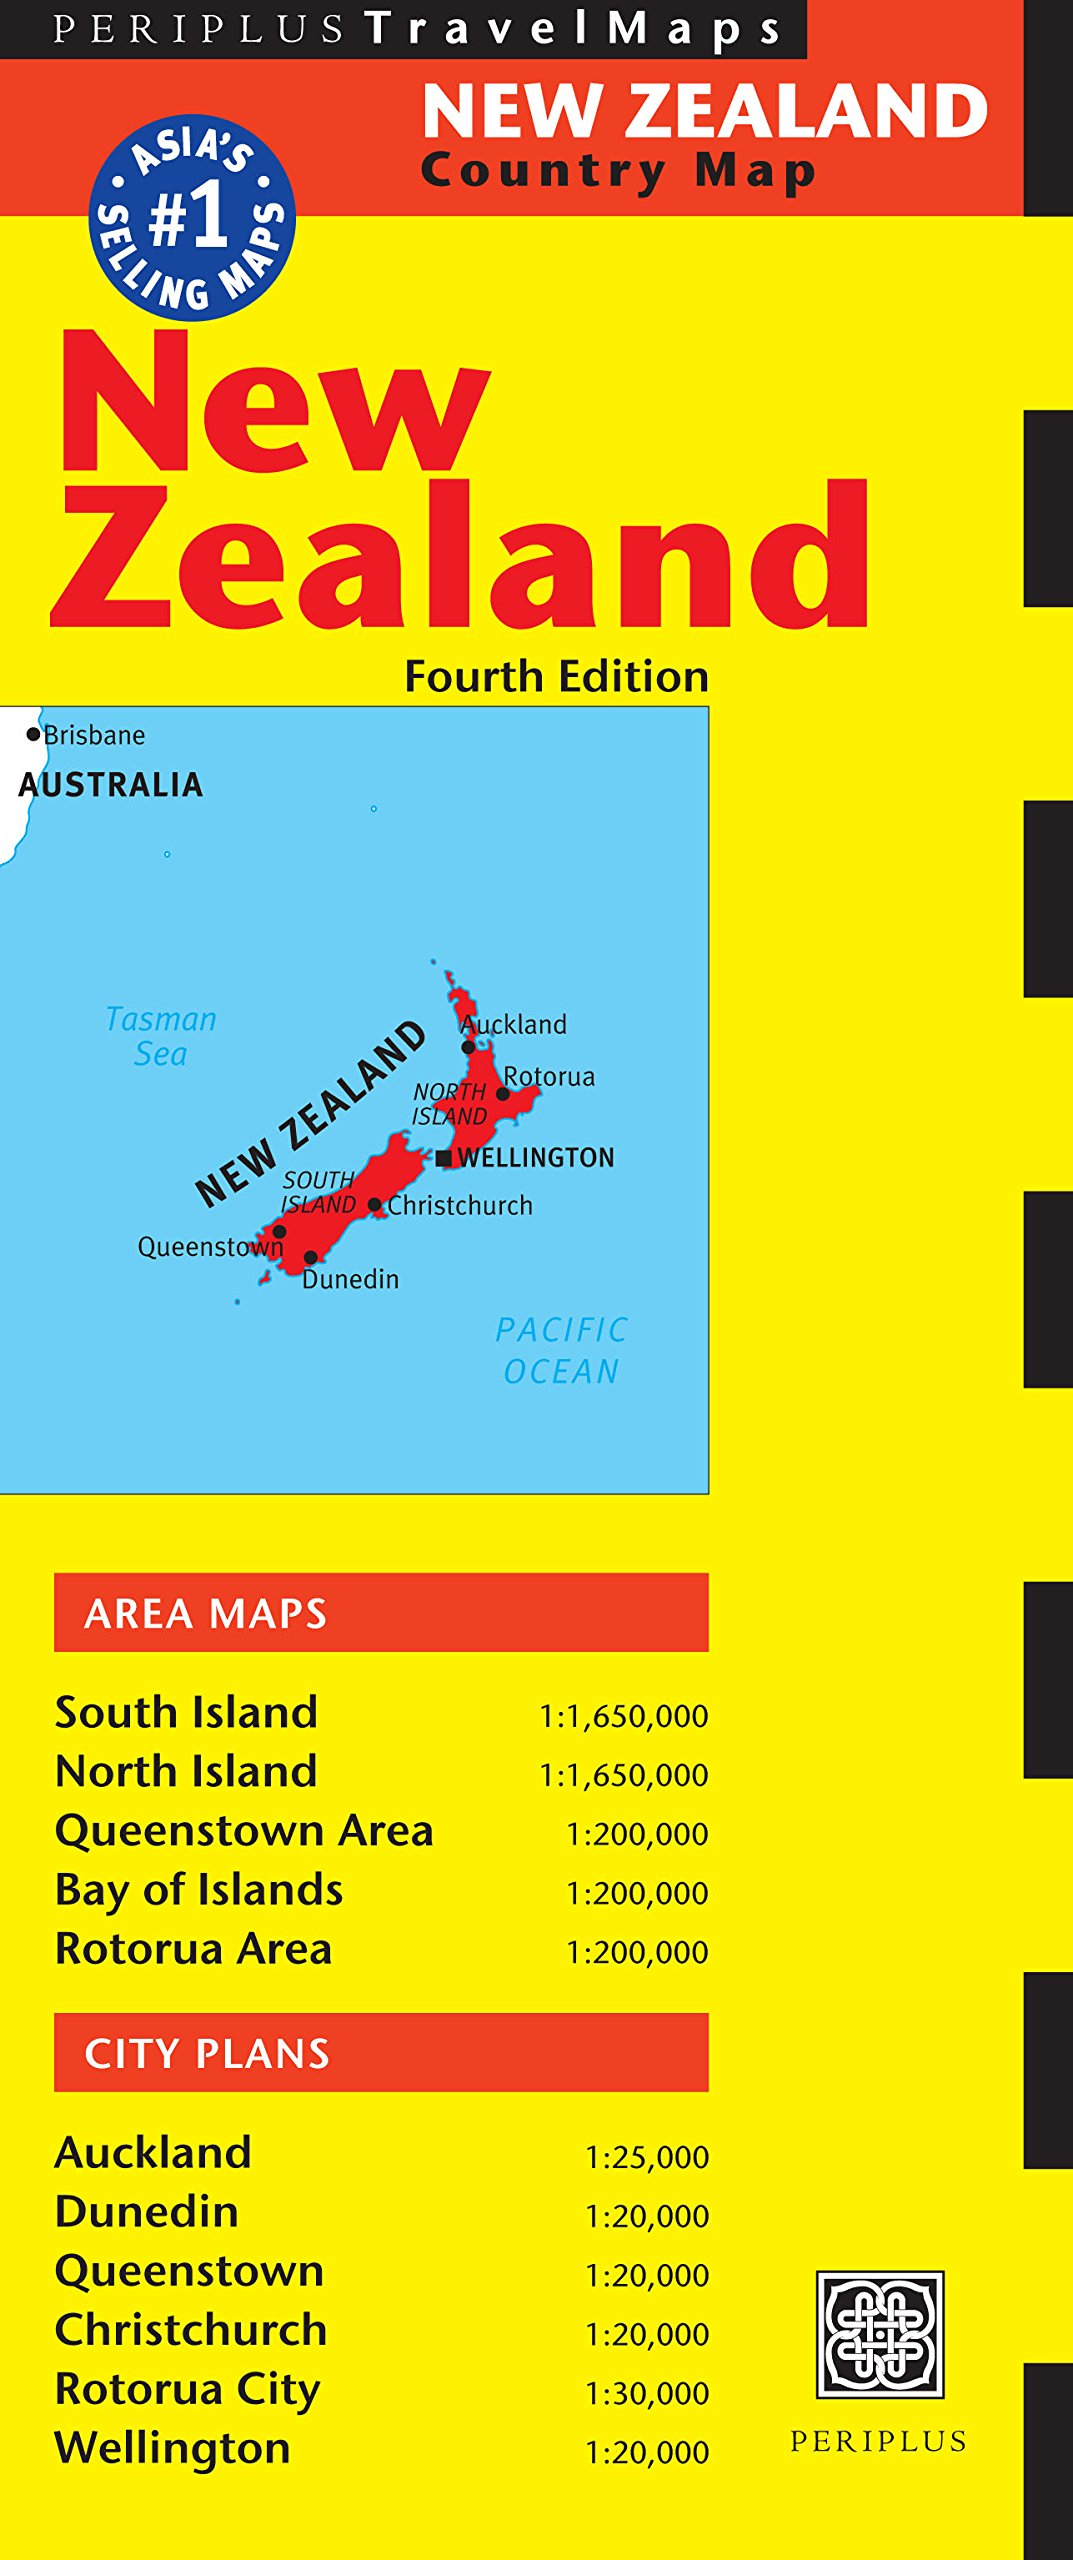 Map Of New Zealand Australia.New Zealand Travel Map Fourth Edition Australia Regional Maps